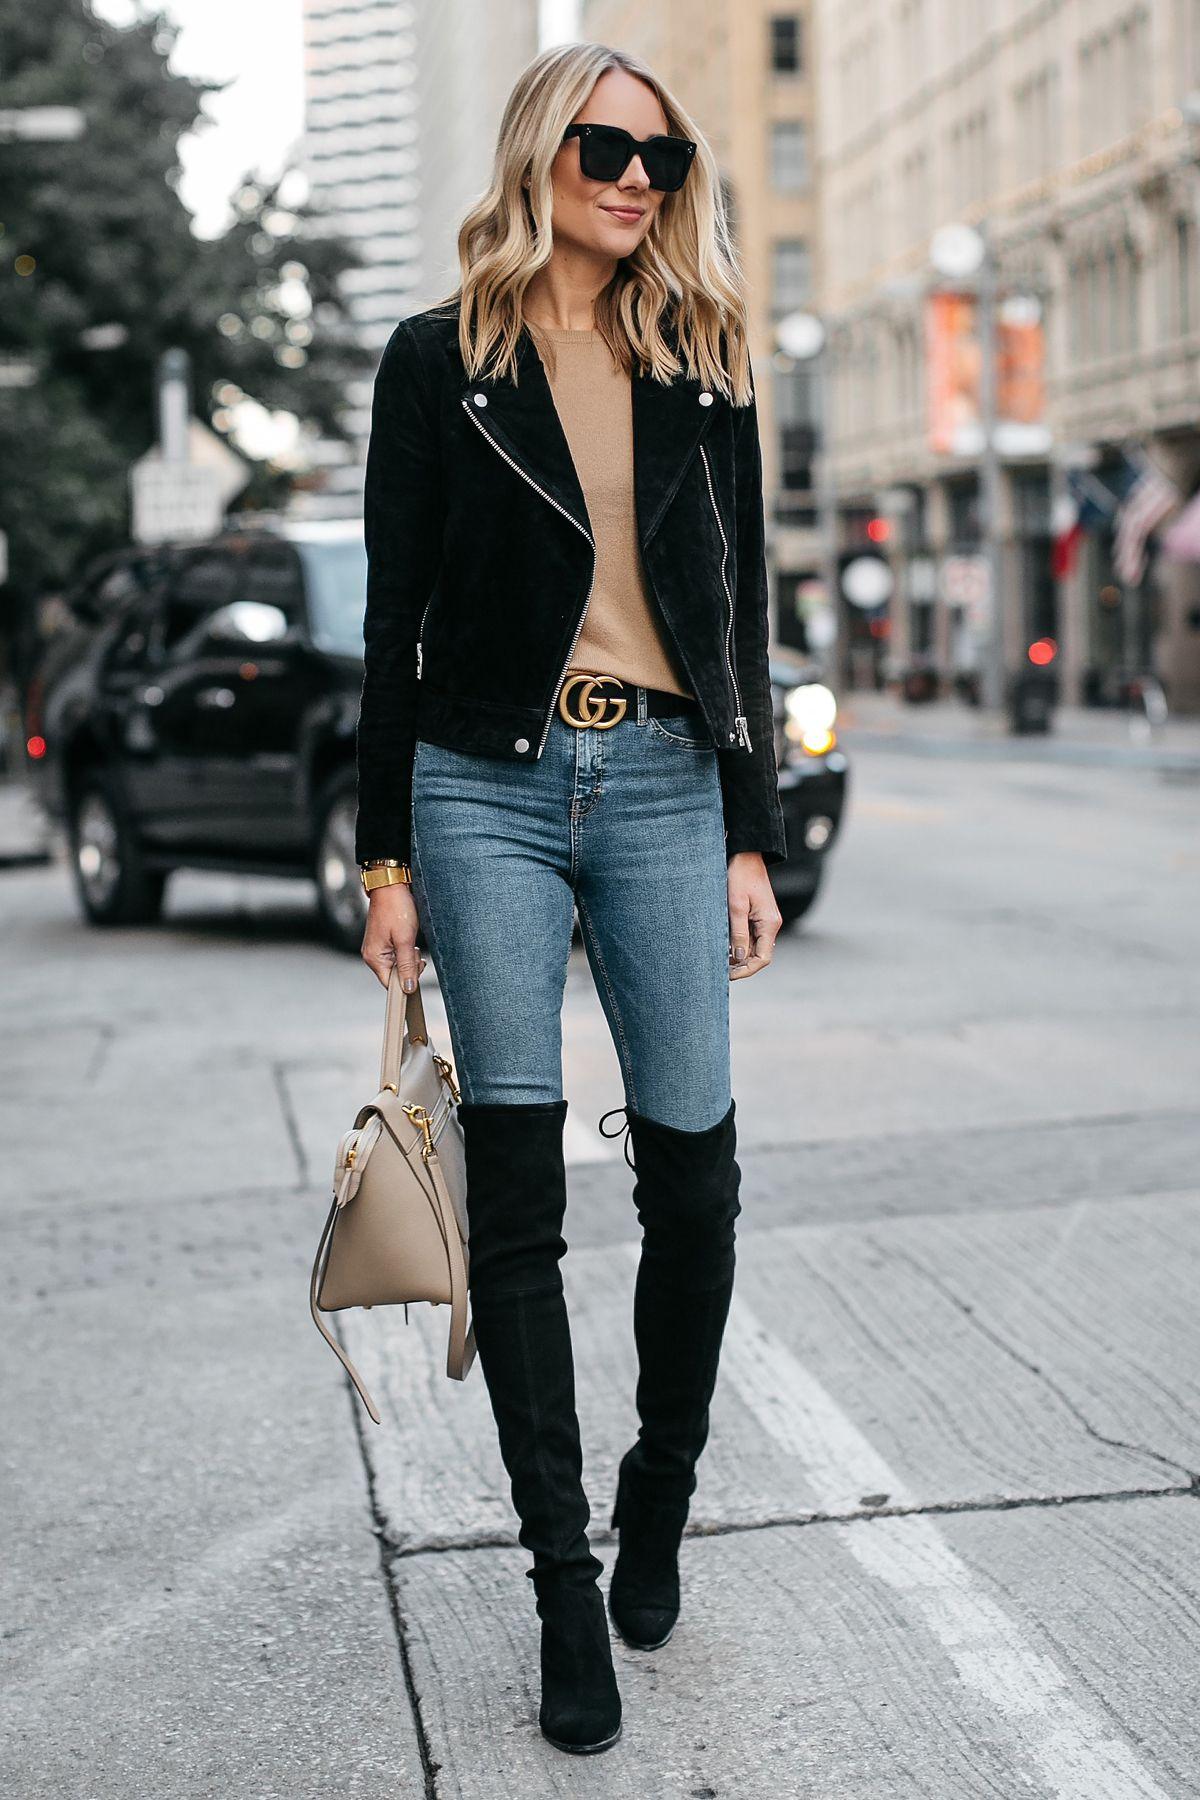 3f3753aa1ee Blonde Woman Wearing Black Suede Moto Jacket Camel Sweater Denim Skinny  Jeans Stuart Weitzman Over-the-Knee boots Gucci Marmont Belt Fashion  Jackson Dallas ...